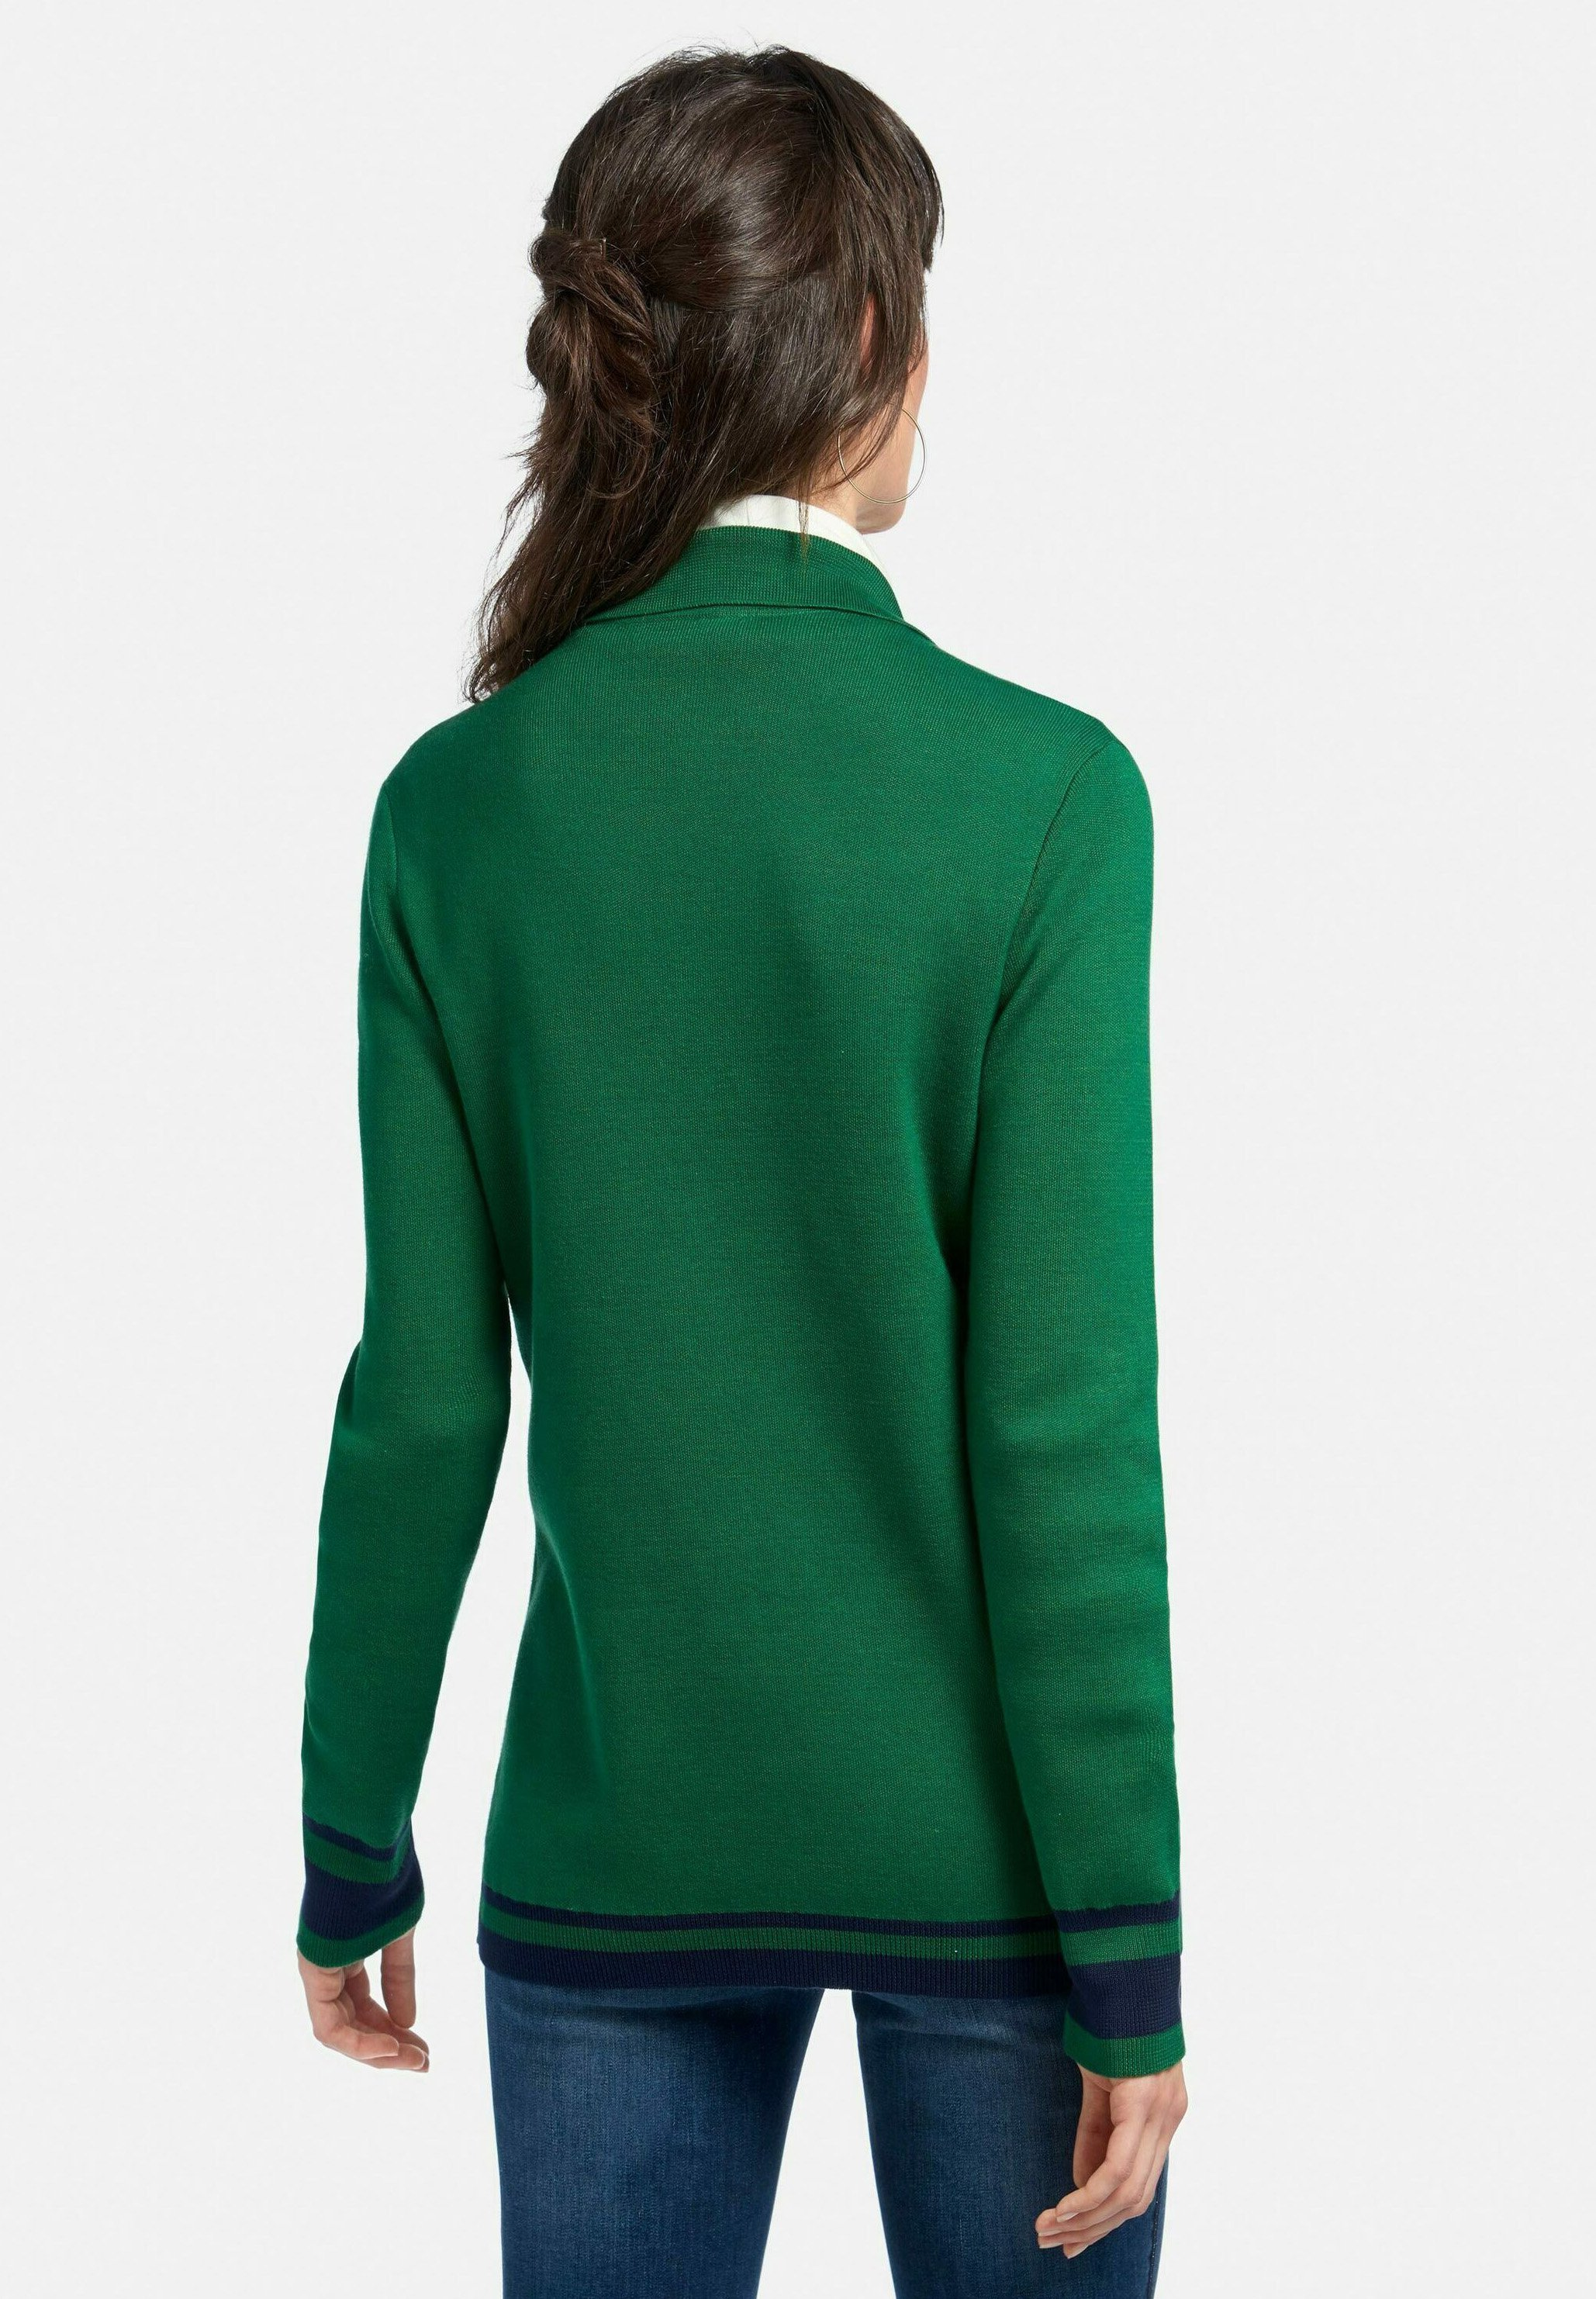 PETER HAHN Blazer dunkelgrün/marine/dunkelgrün